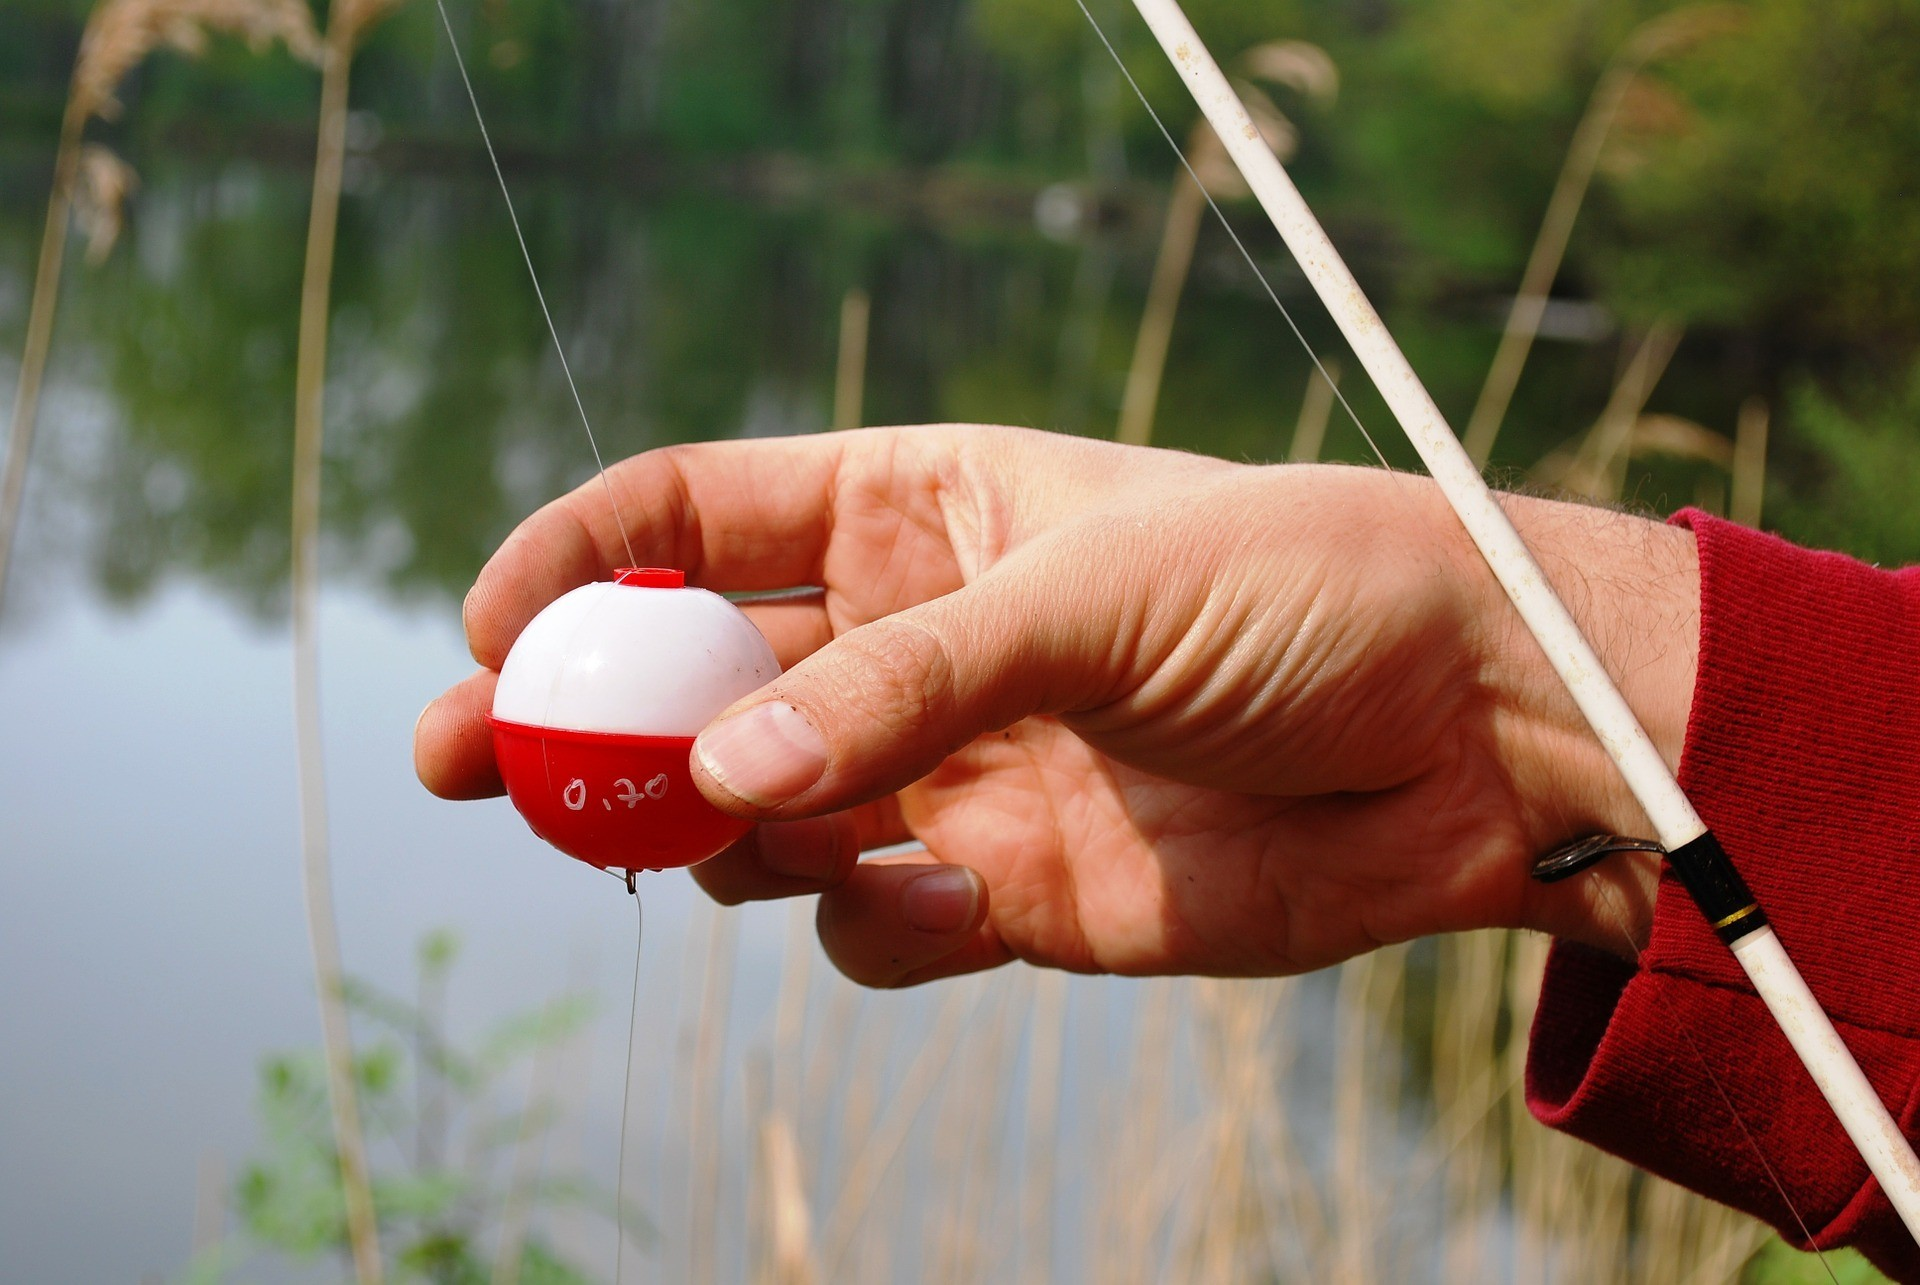 fishing-pole-332456_1920